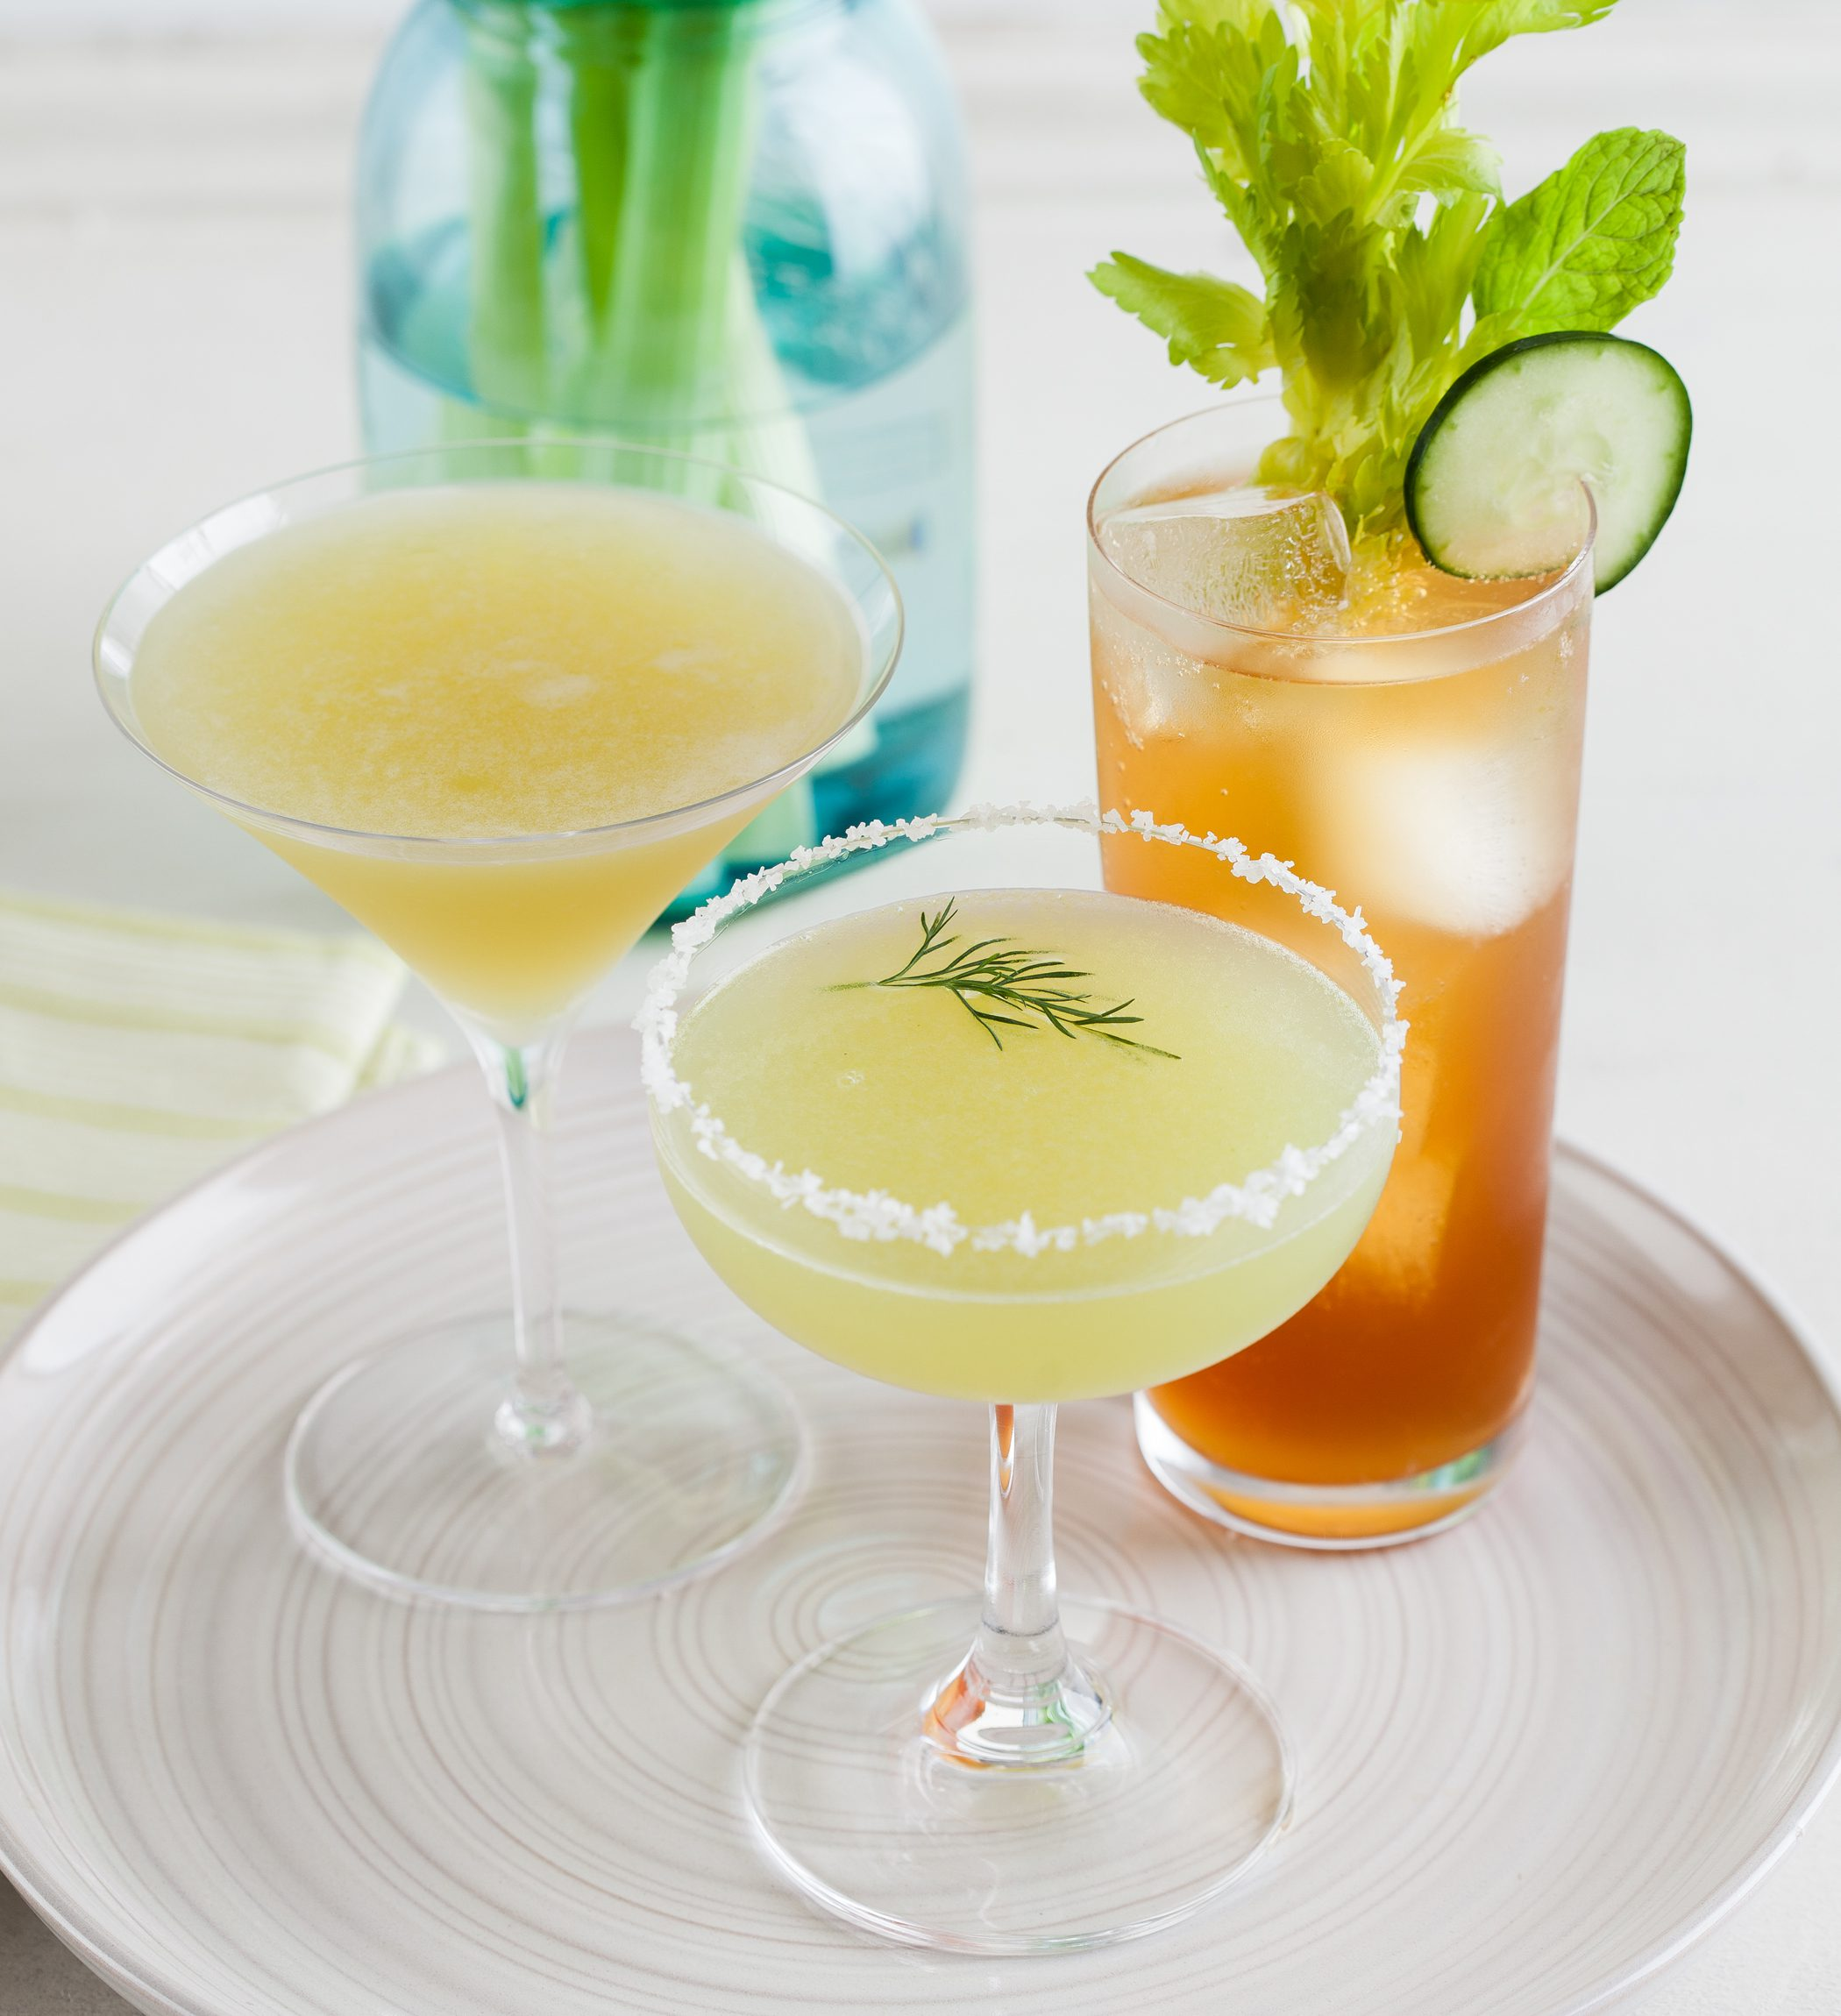 celery elements